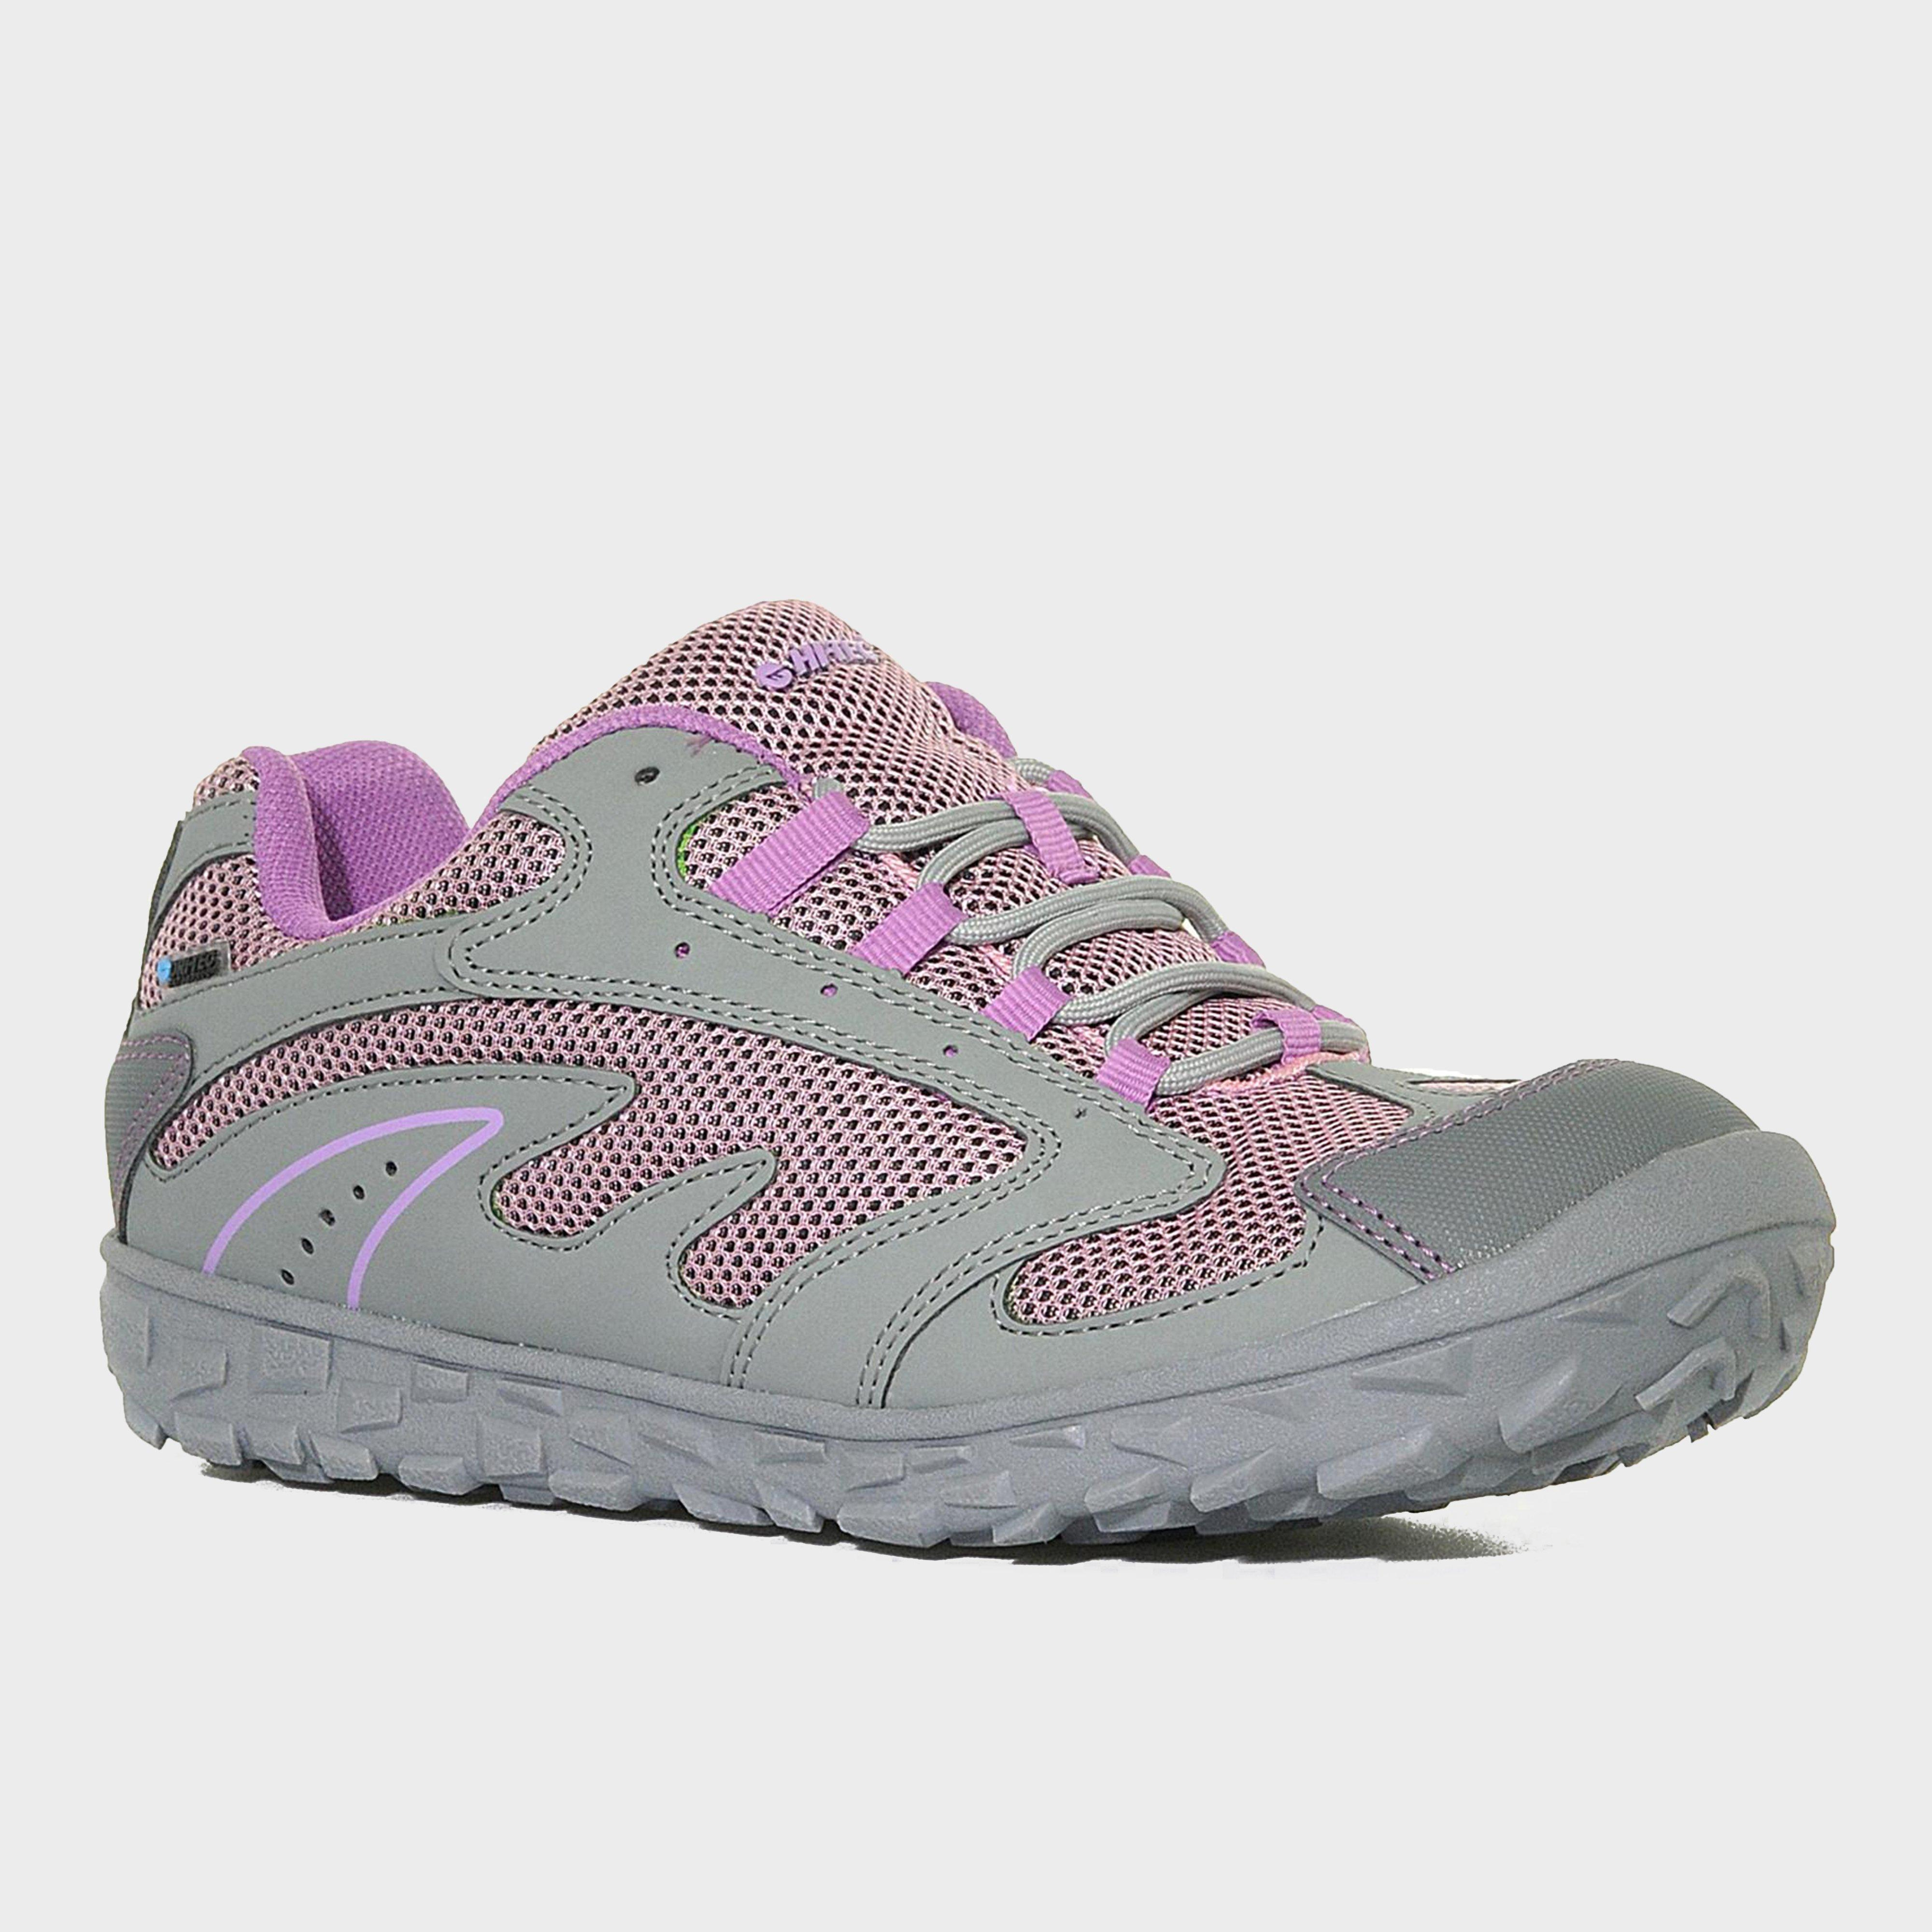 Meridian Hikking Running Shoes